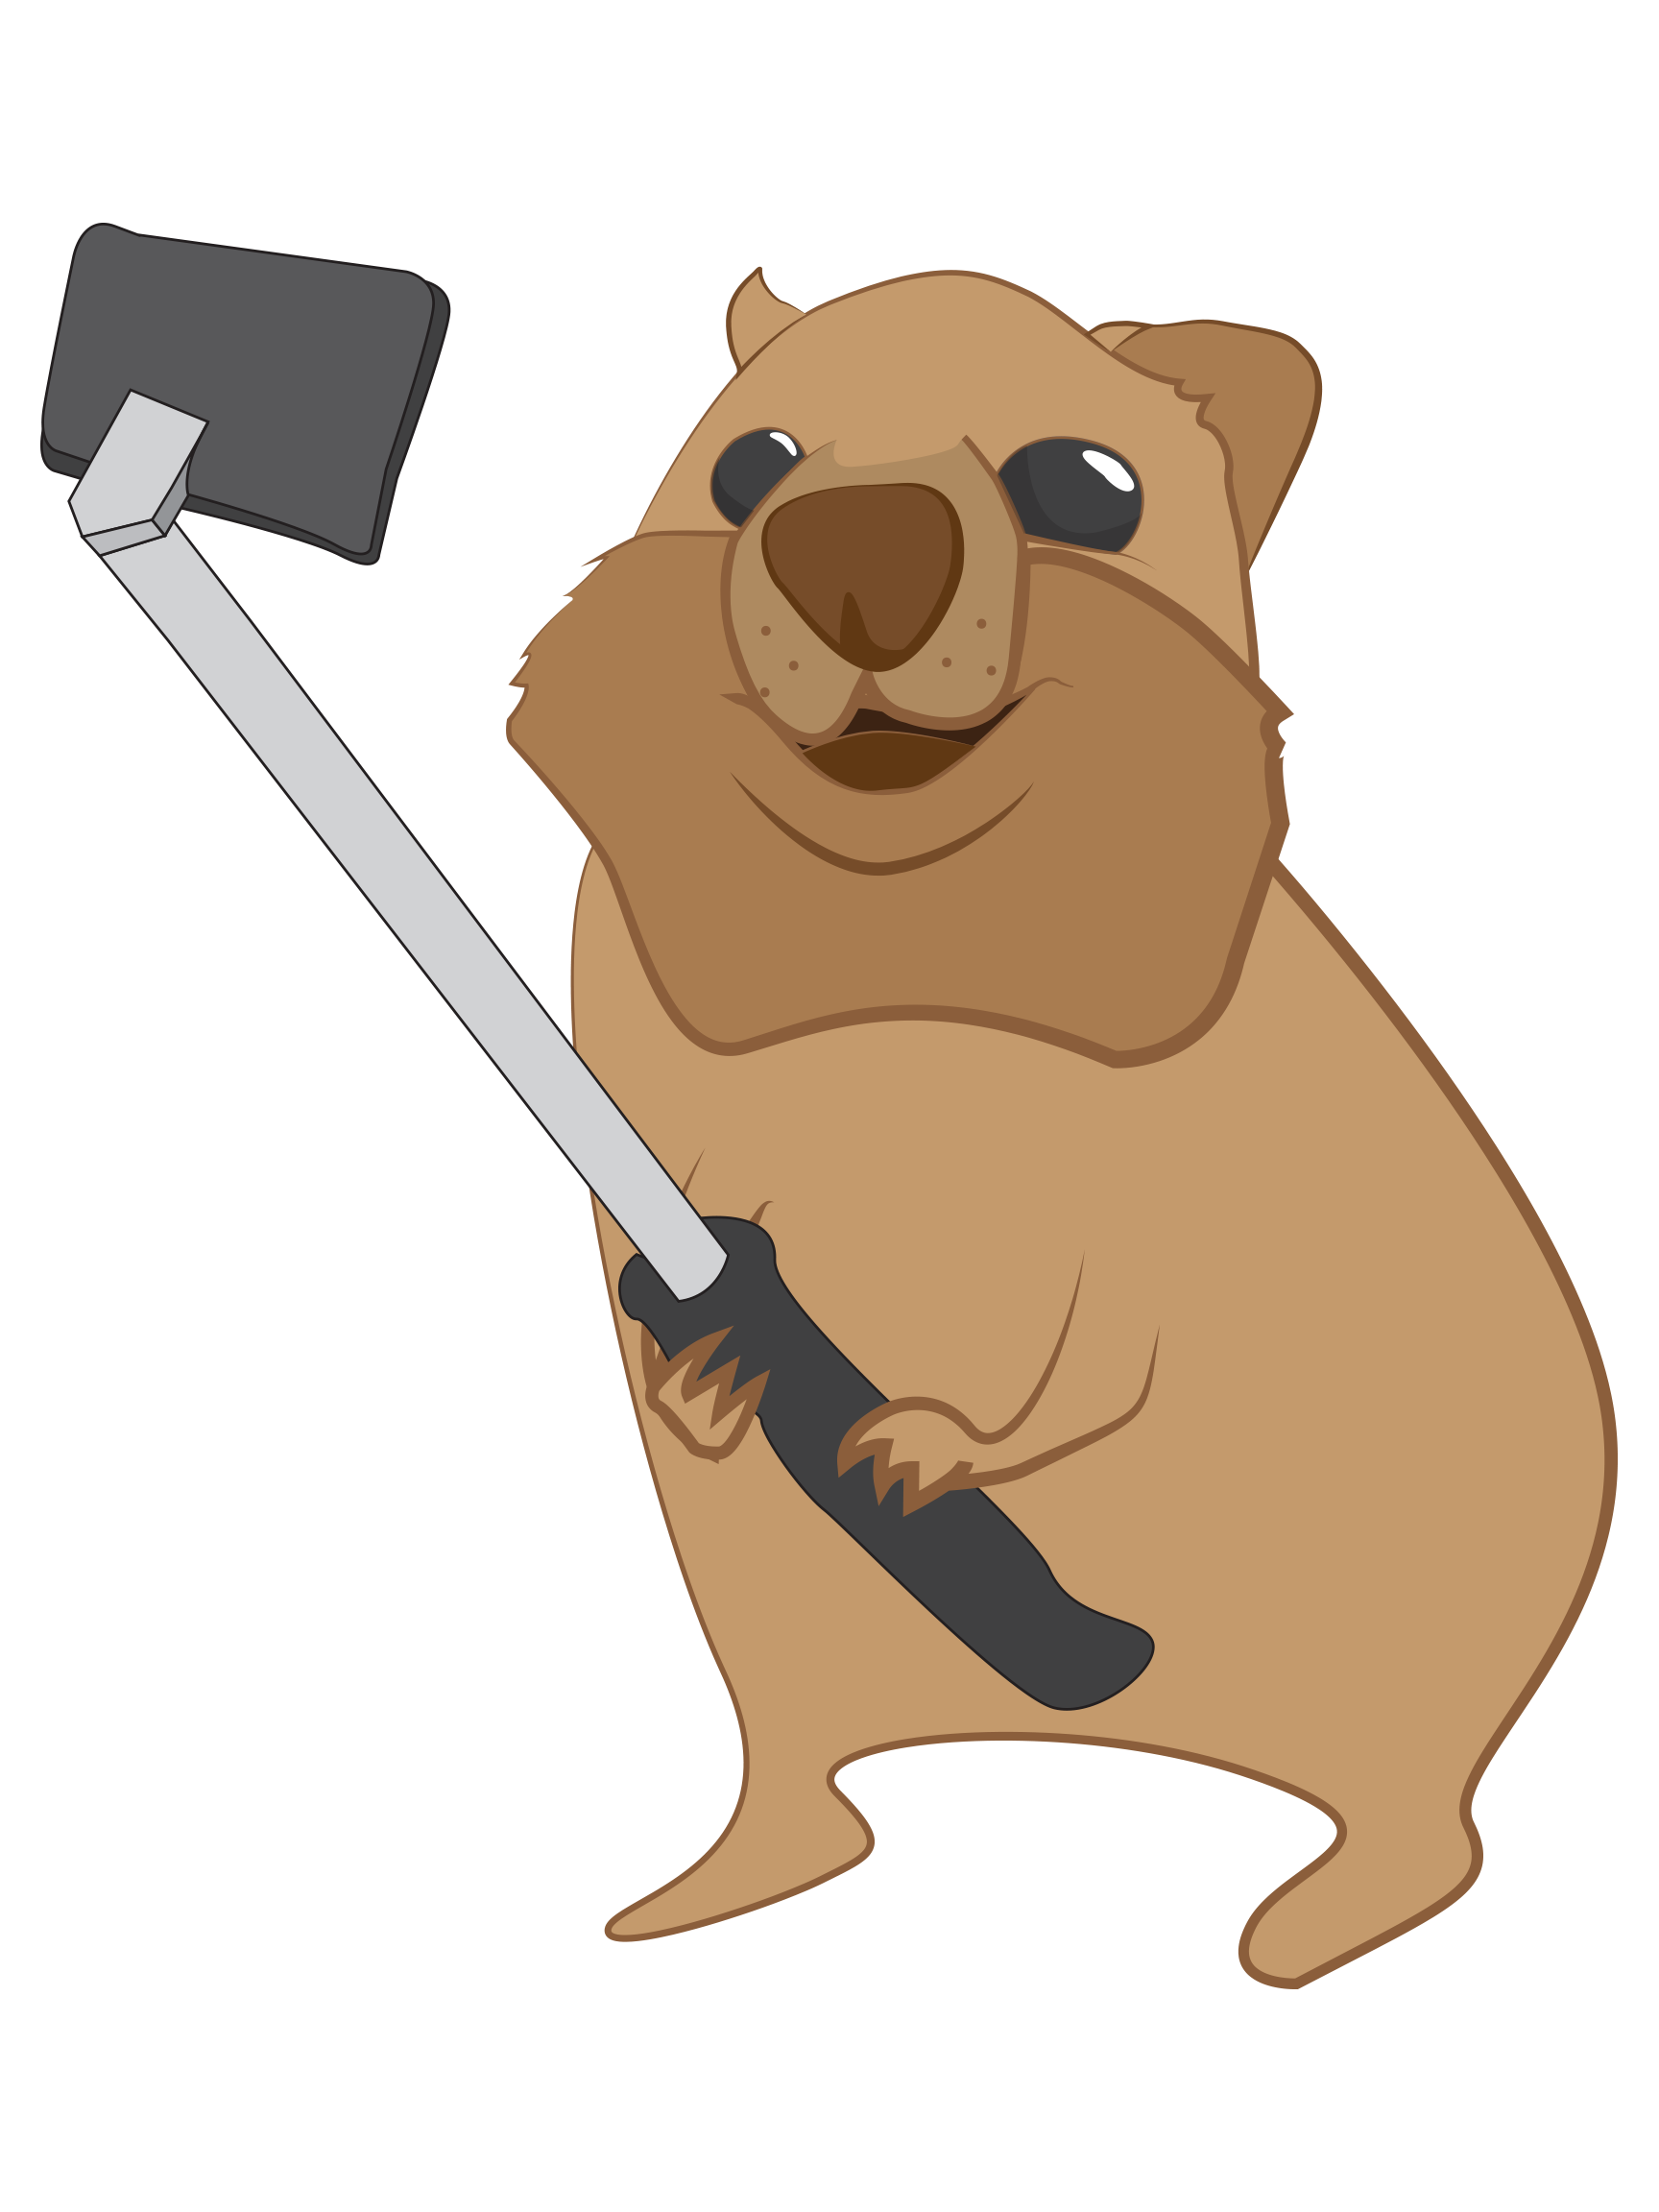 Quokka clipart Quokka selfie with stick Quokka